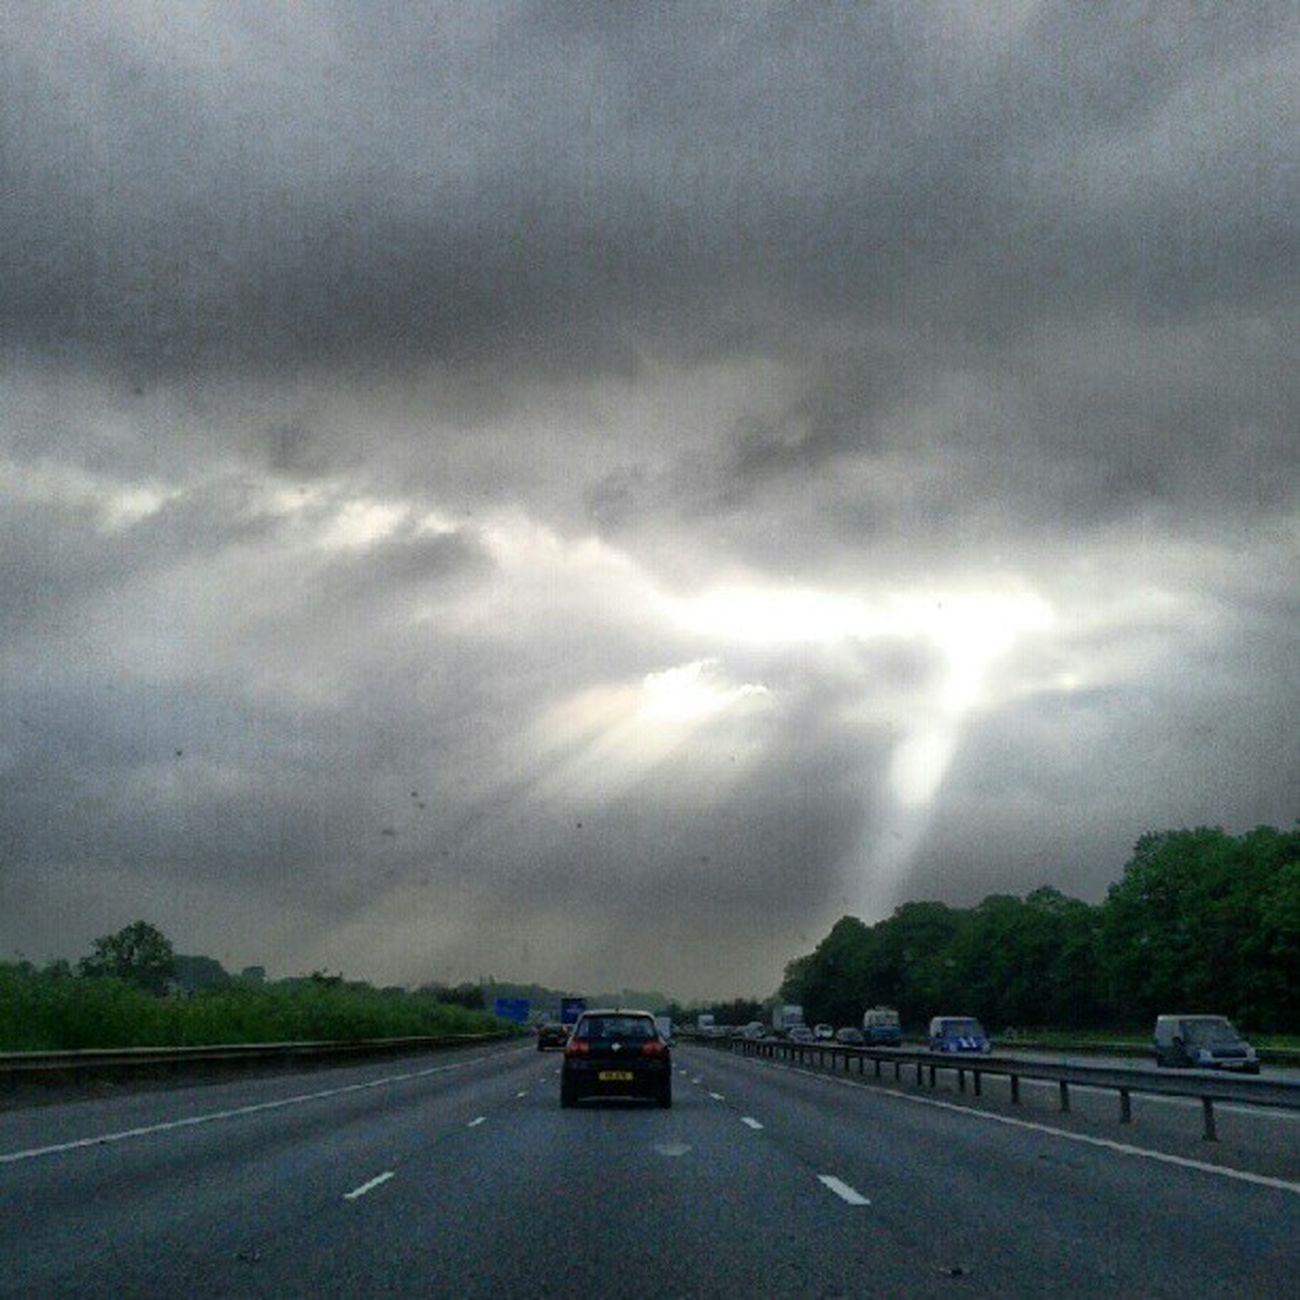 #commute #m56 #instegramhub Commute Gf_daily_cloudscape_010 Instegramhub M56